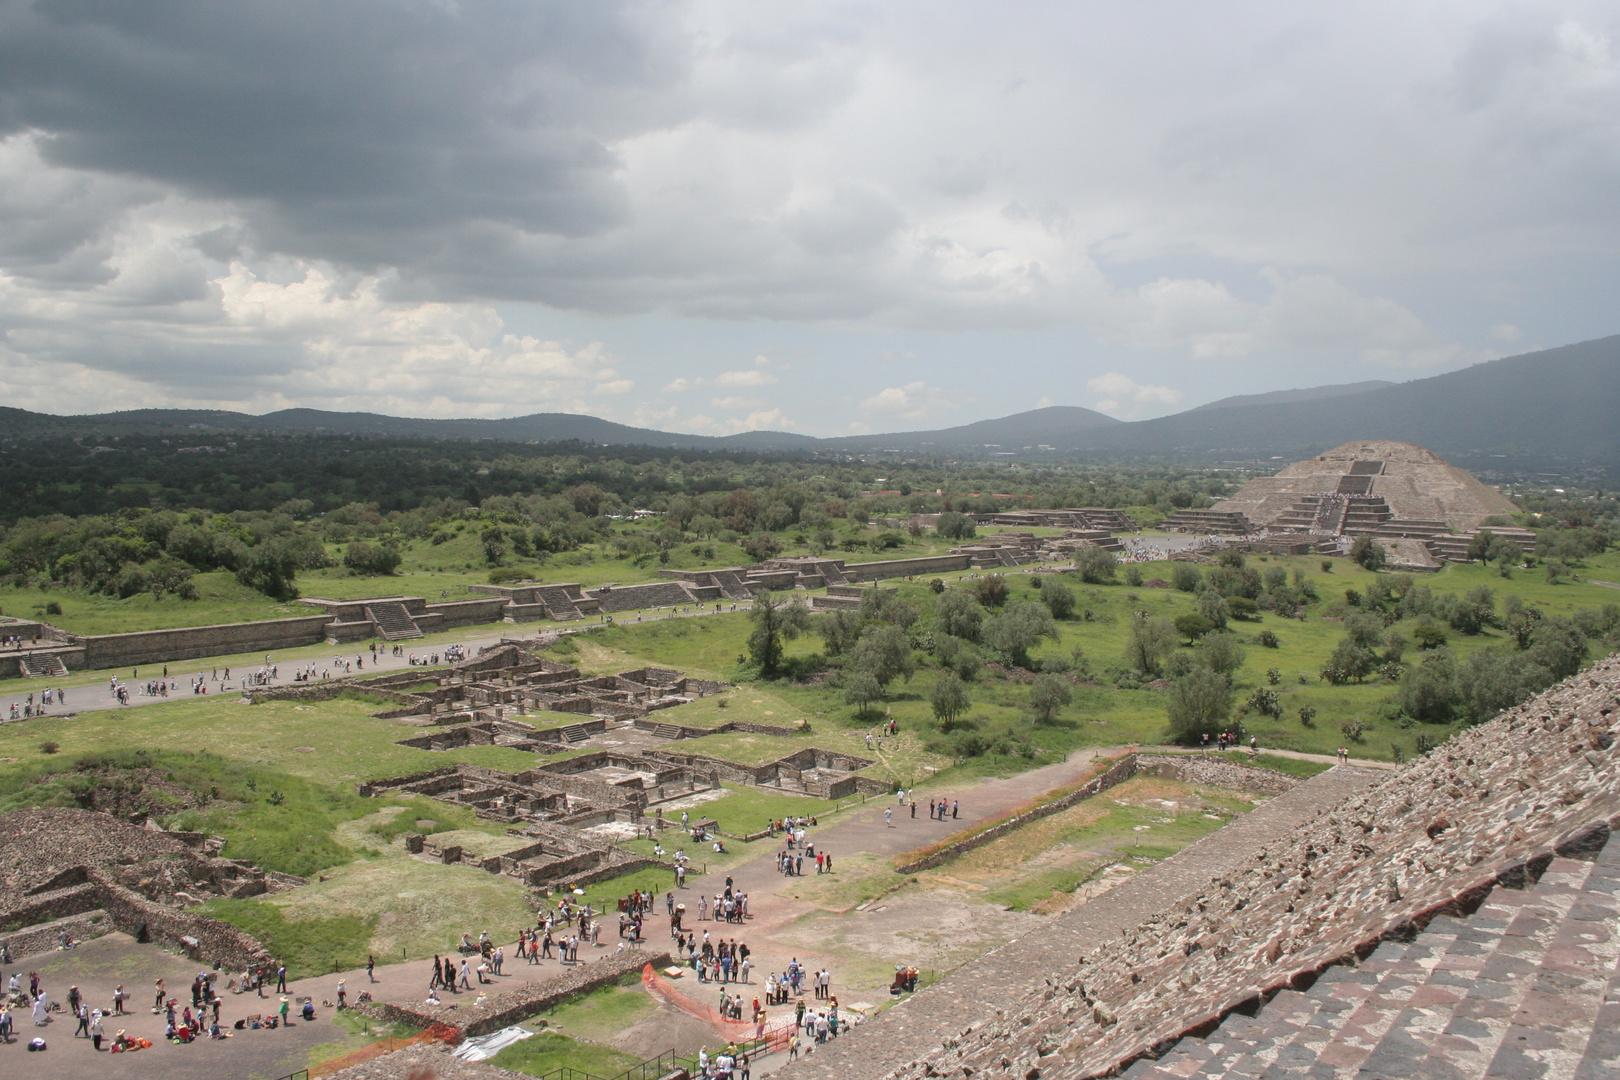 ZONA ARQUEOLOGICA DE TEOTIHUACAN MEX.